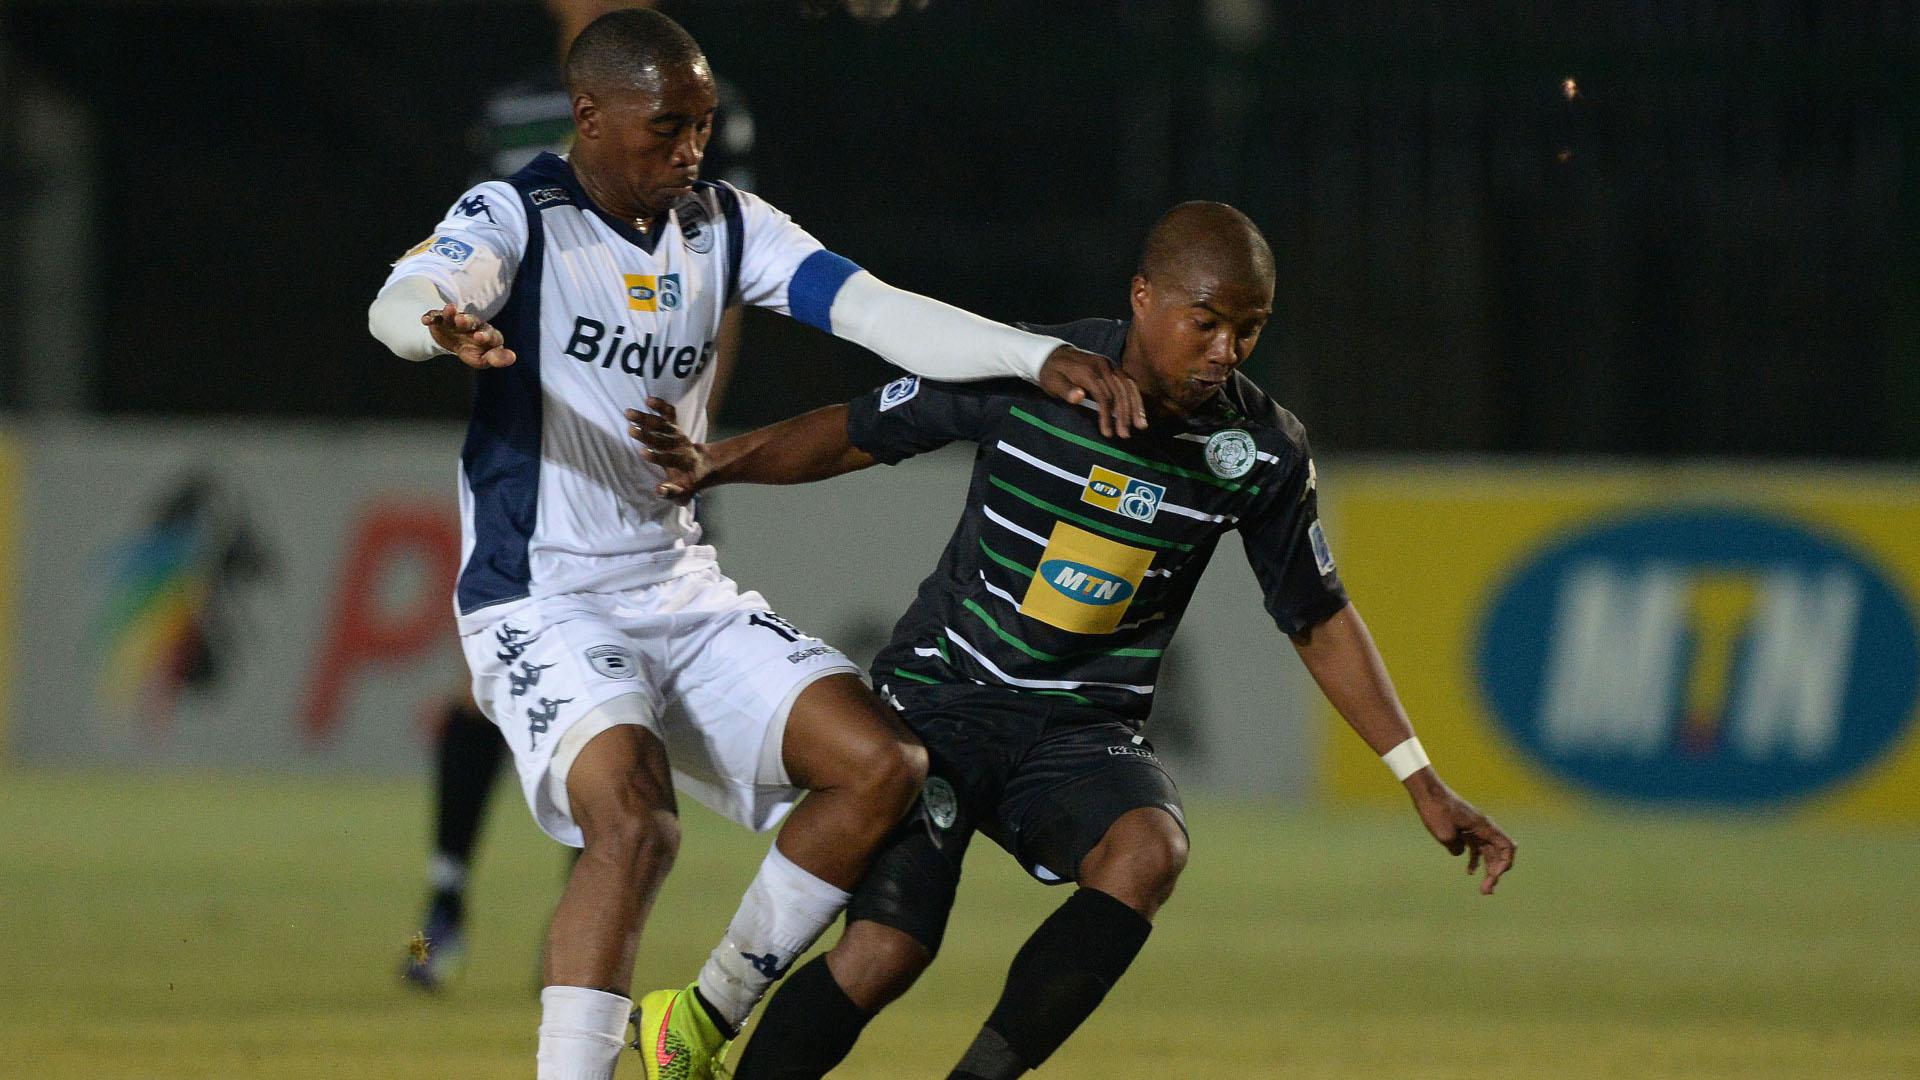 Absa Premiership 2019/20 | Bidvest Wits v Golden Arrows | Highlights